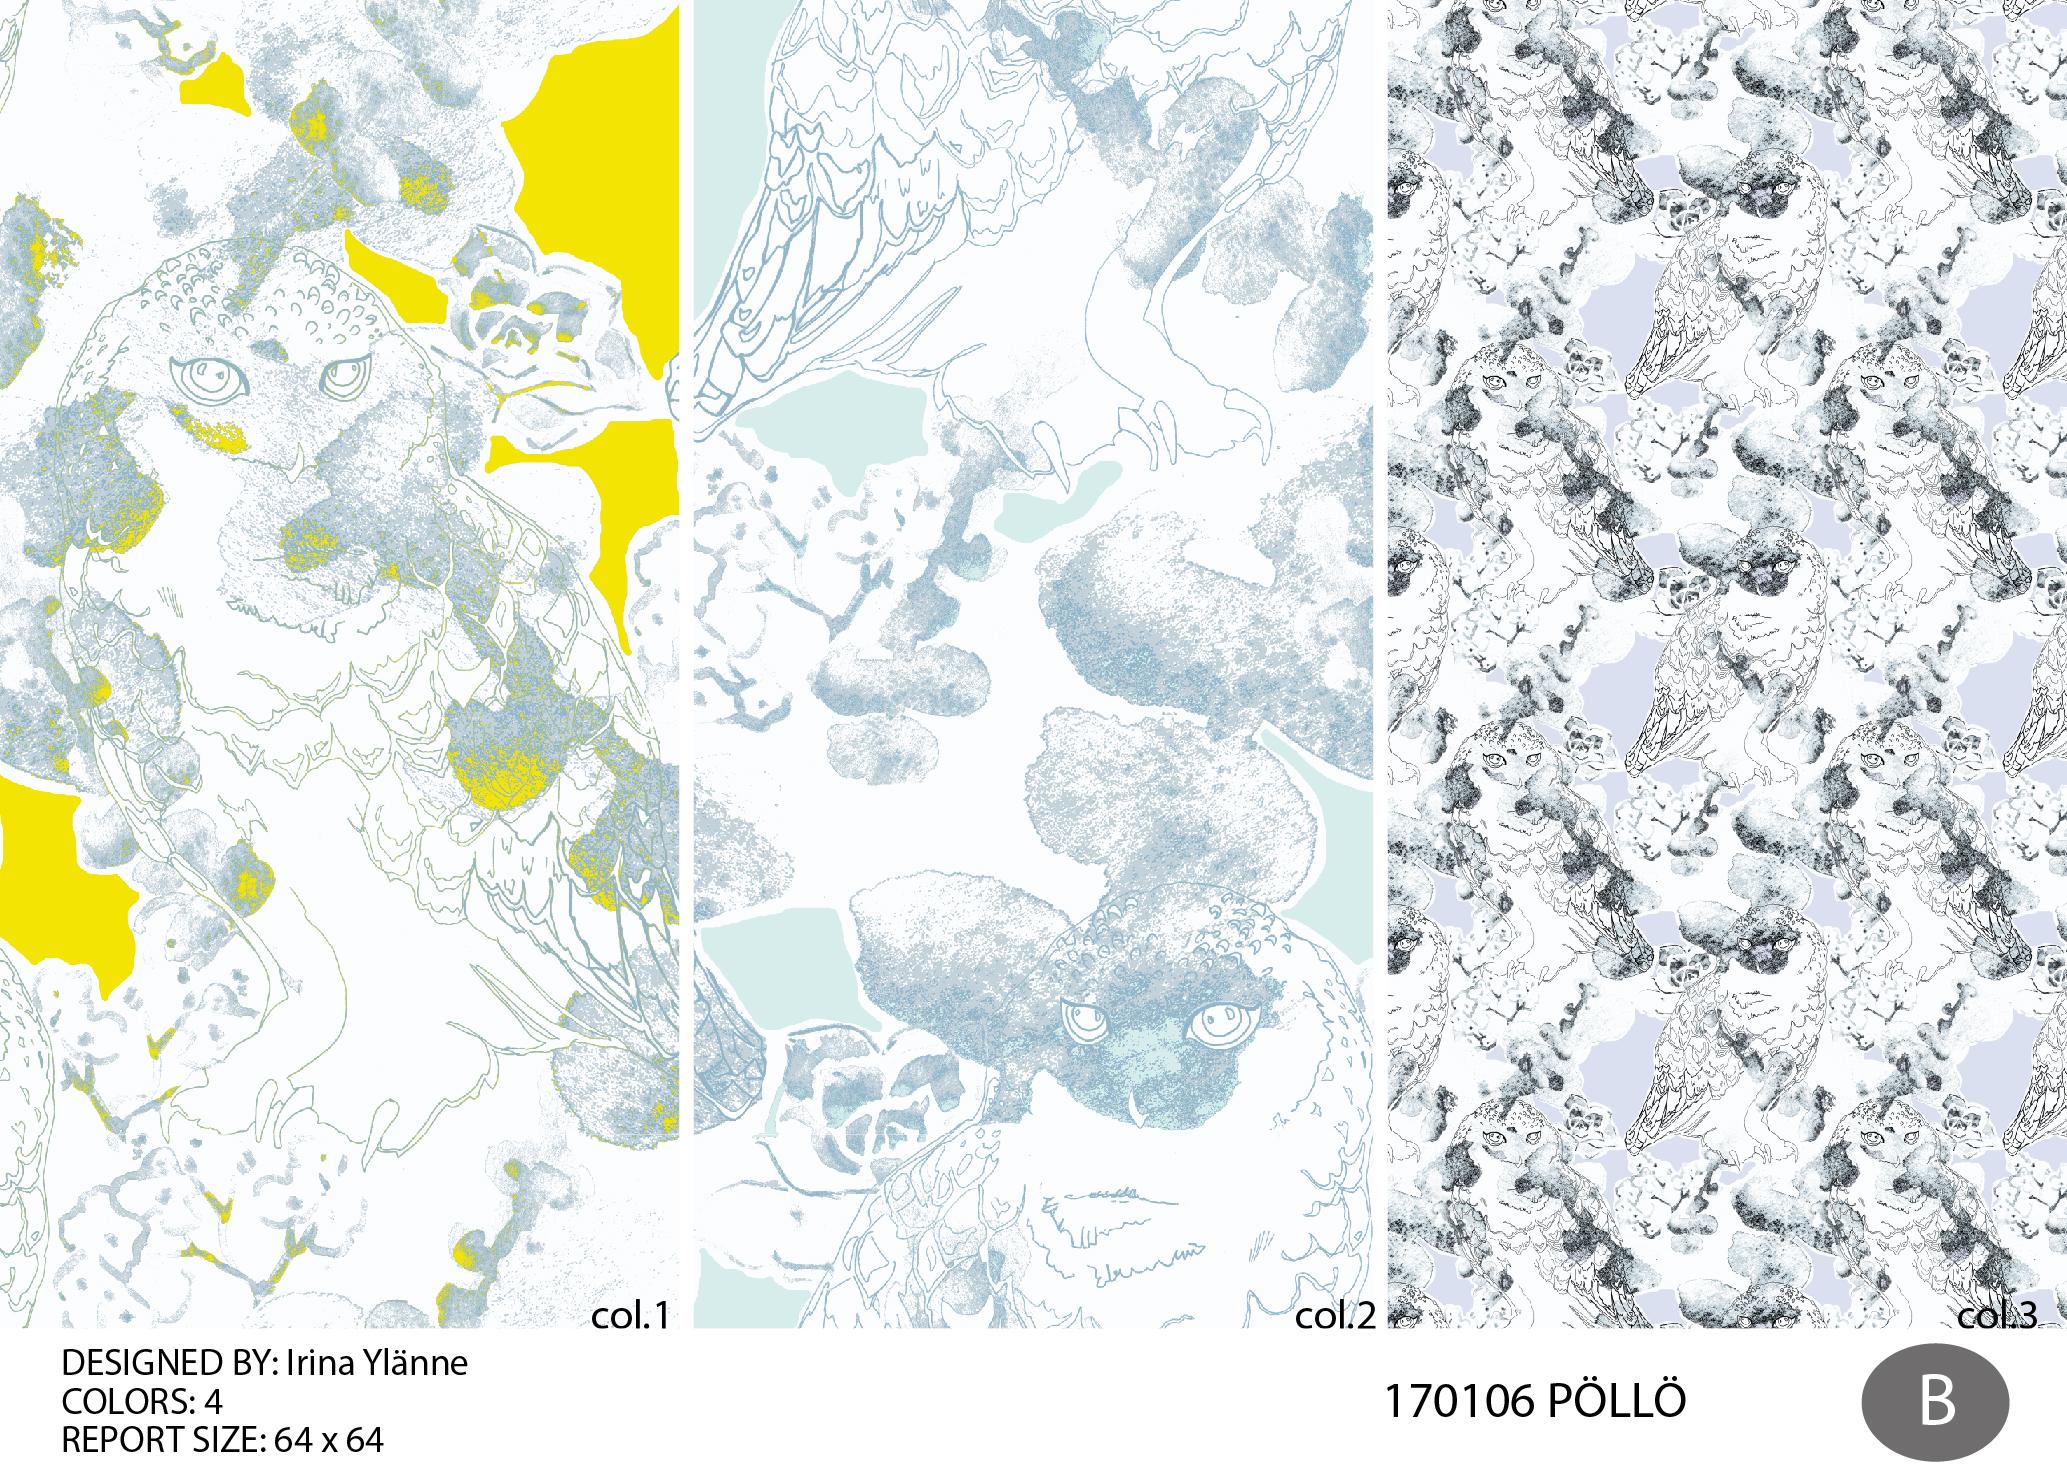 irina pöllö_170106-02